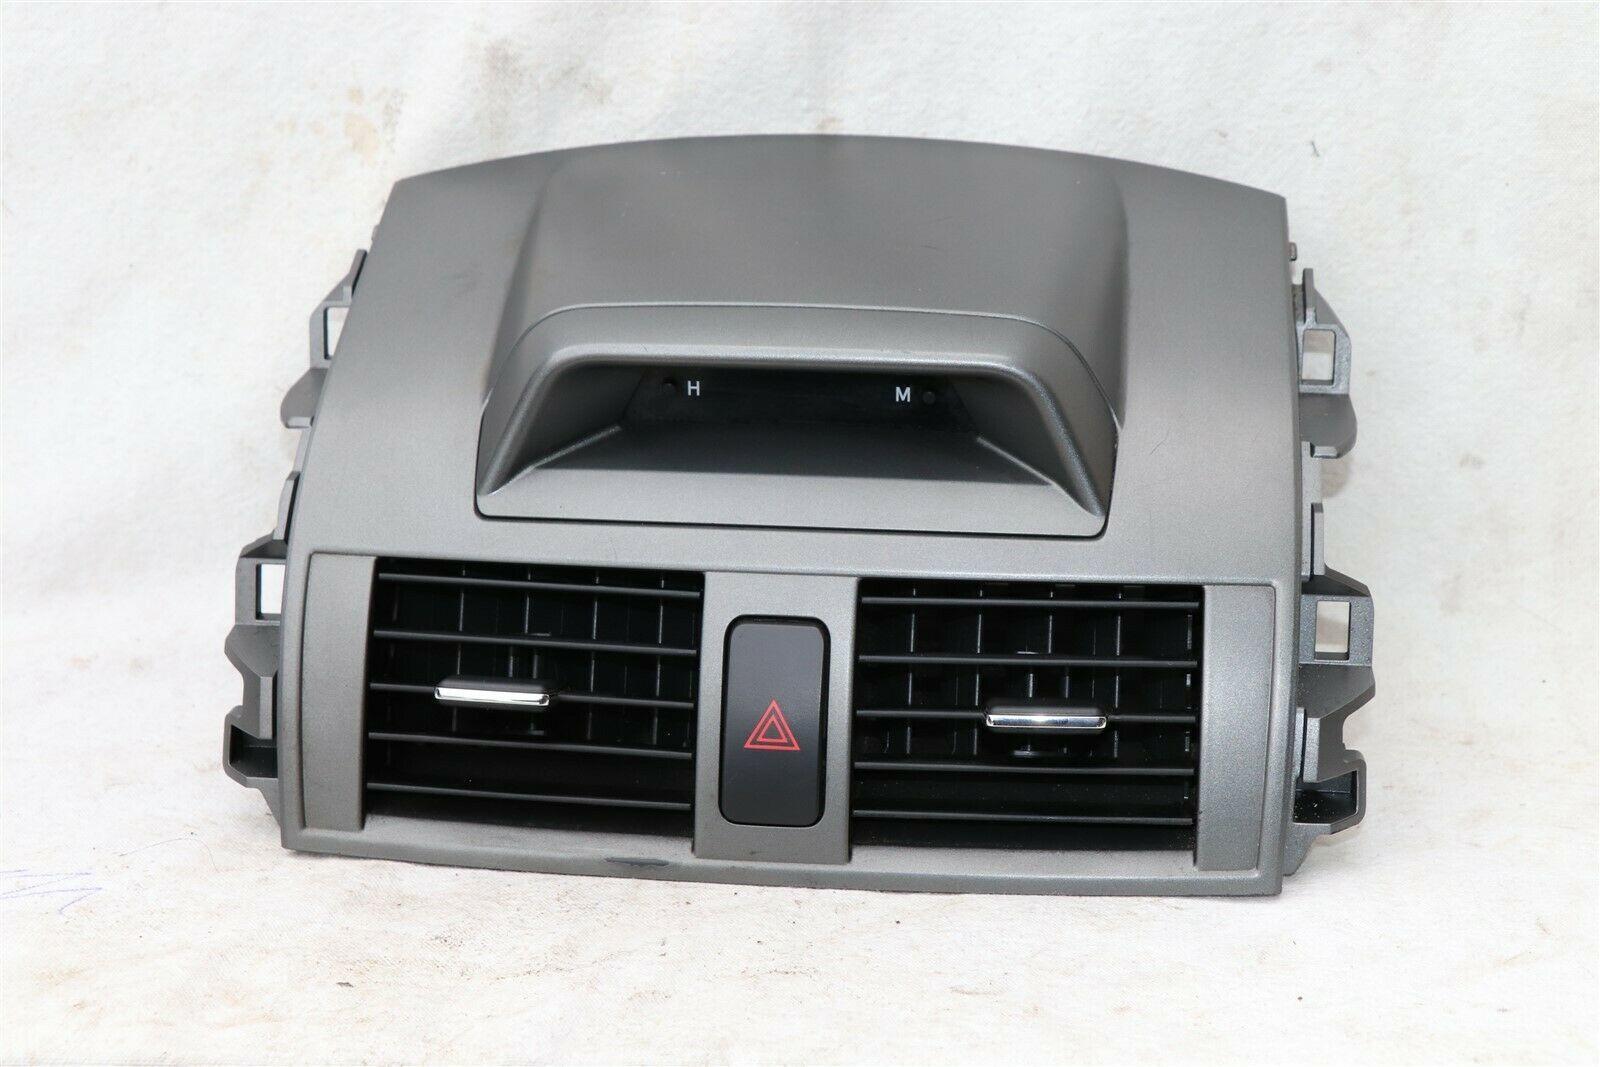 09-11 Toyota Corolla OEM Black Center Dash Top Trim Bezel Air Vents W/ Clock